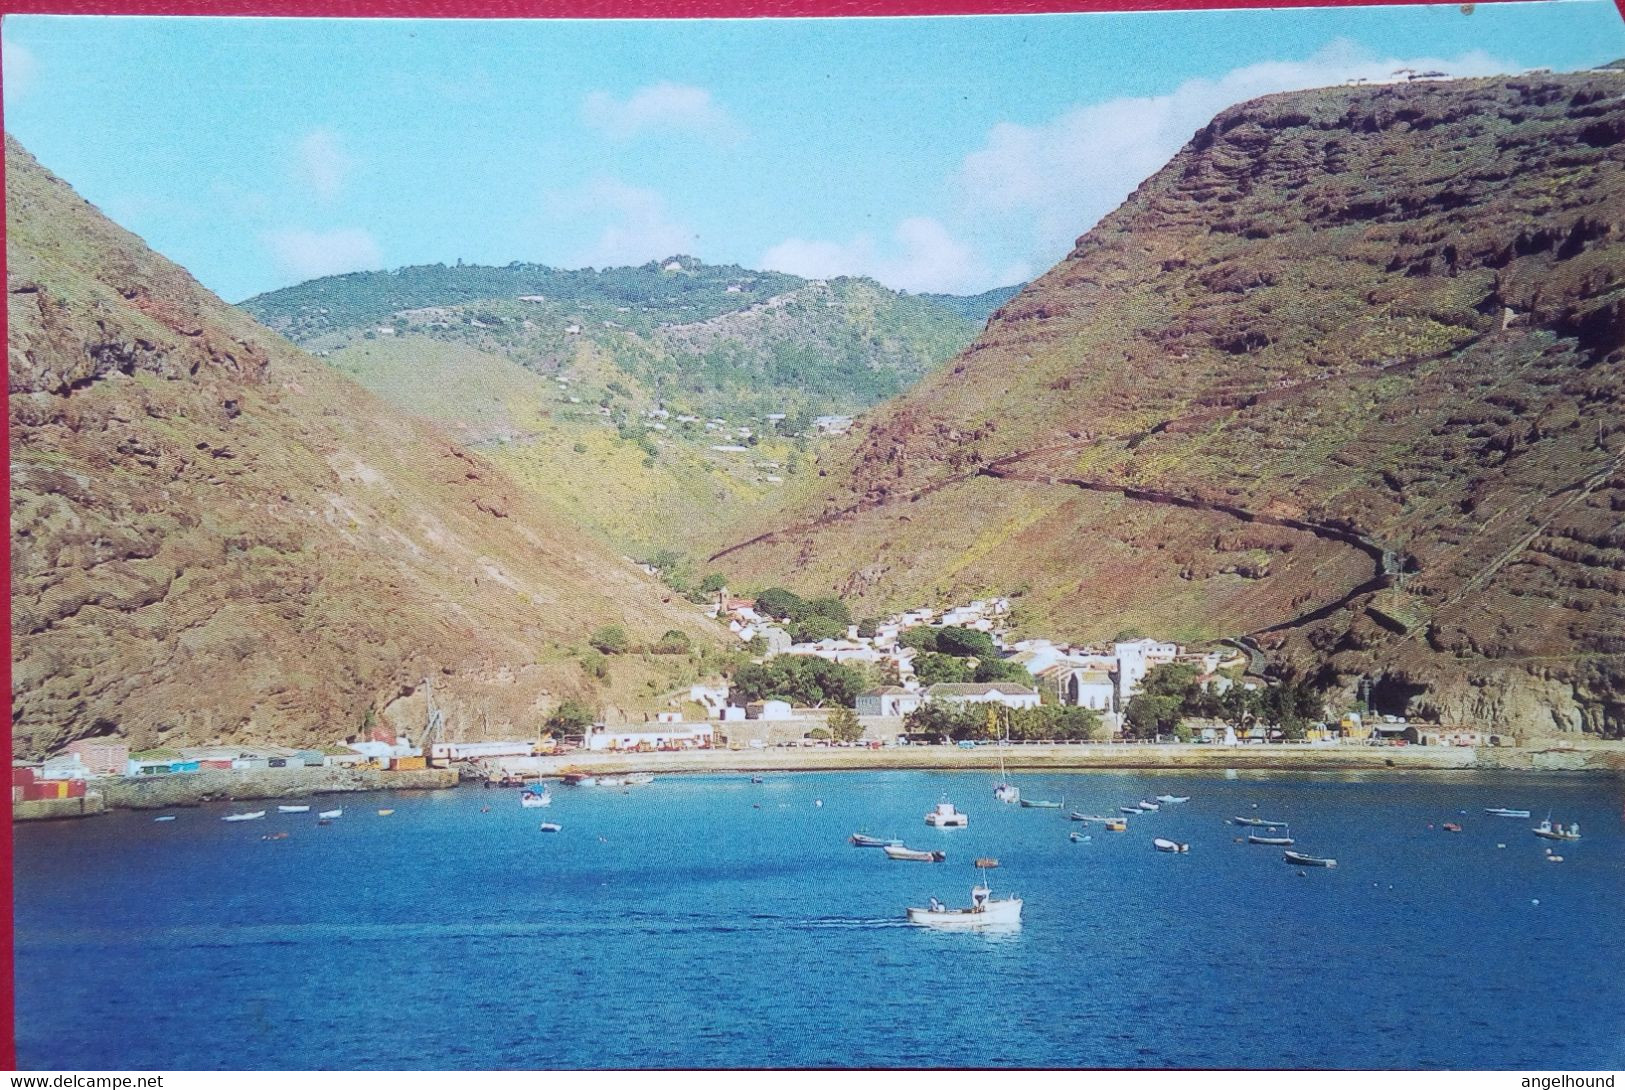 Jamestown, St Helena - St. Helena